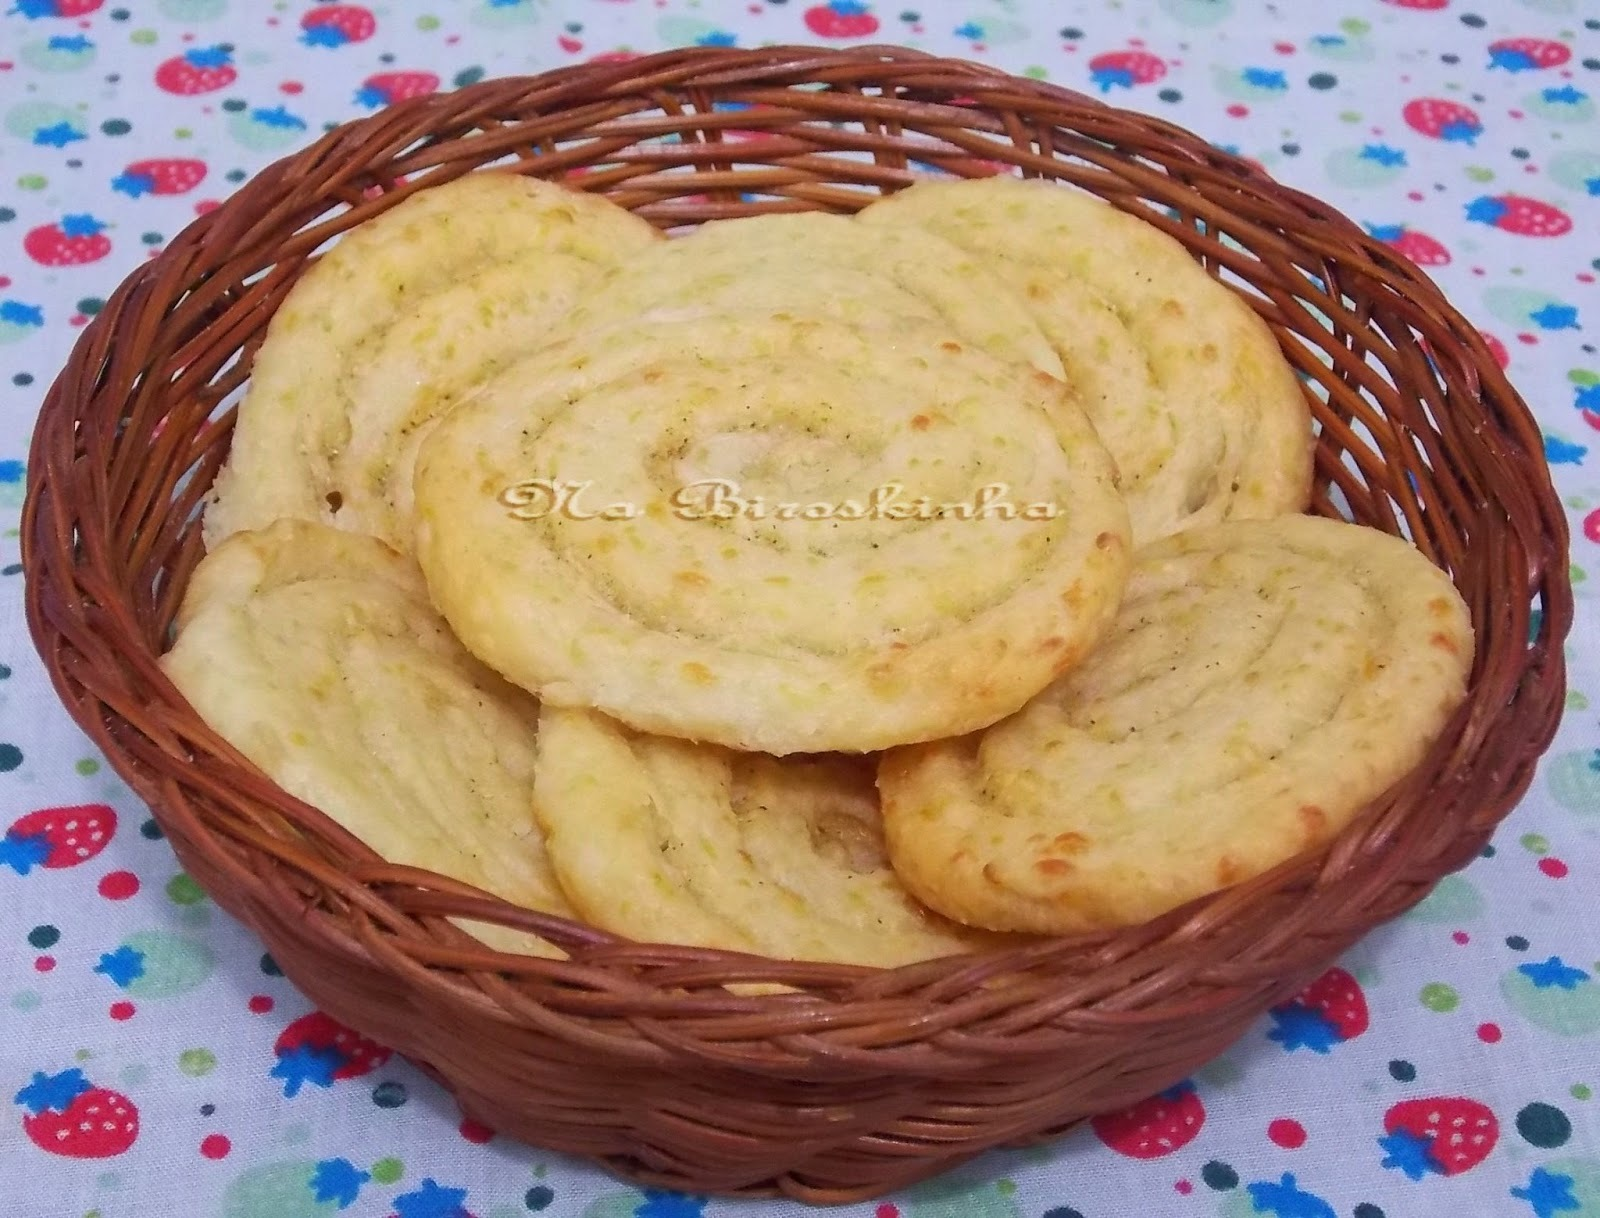 de biscoito mineiro de trigo e queijo